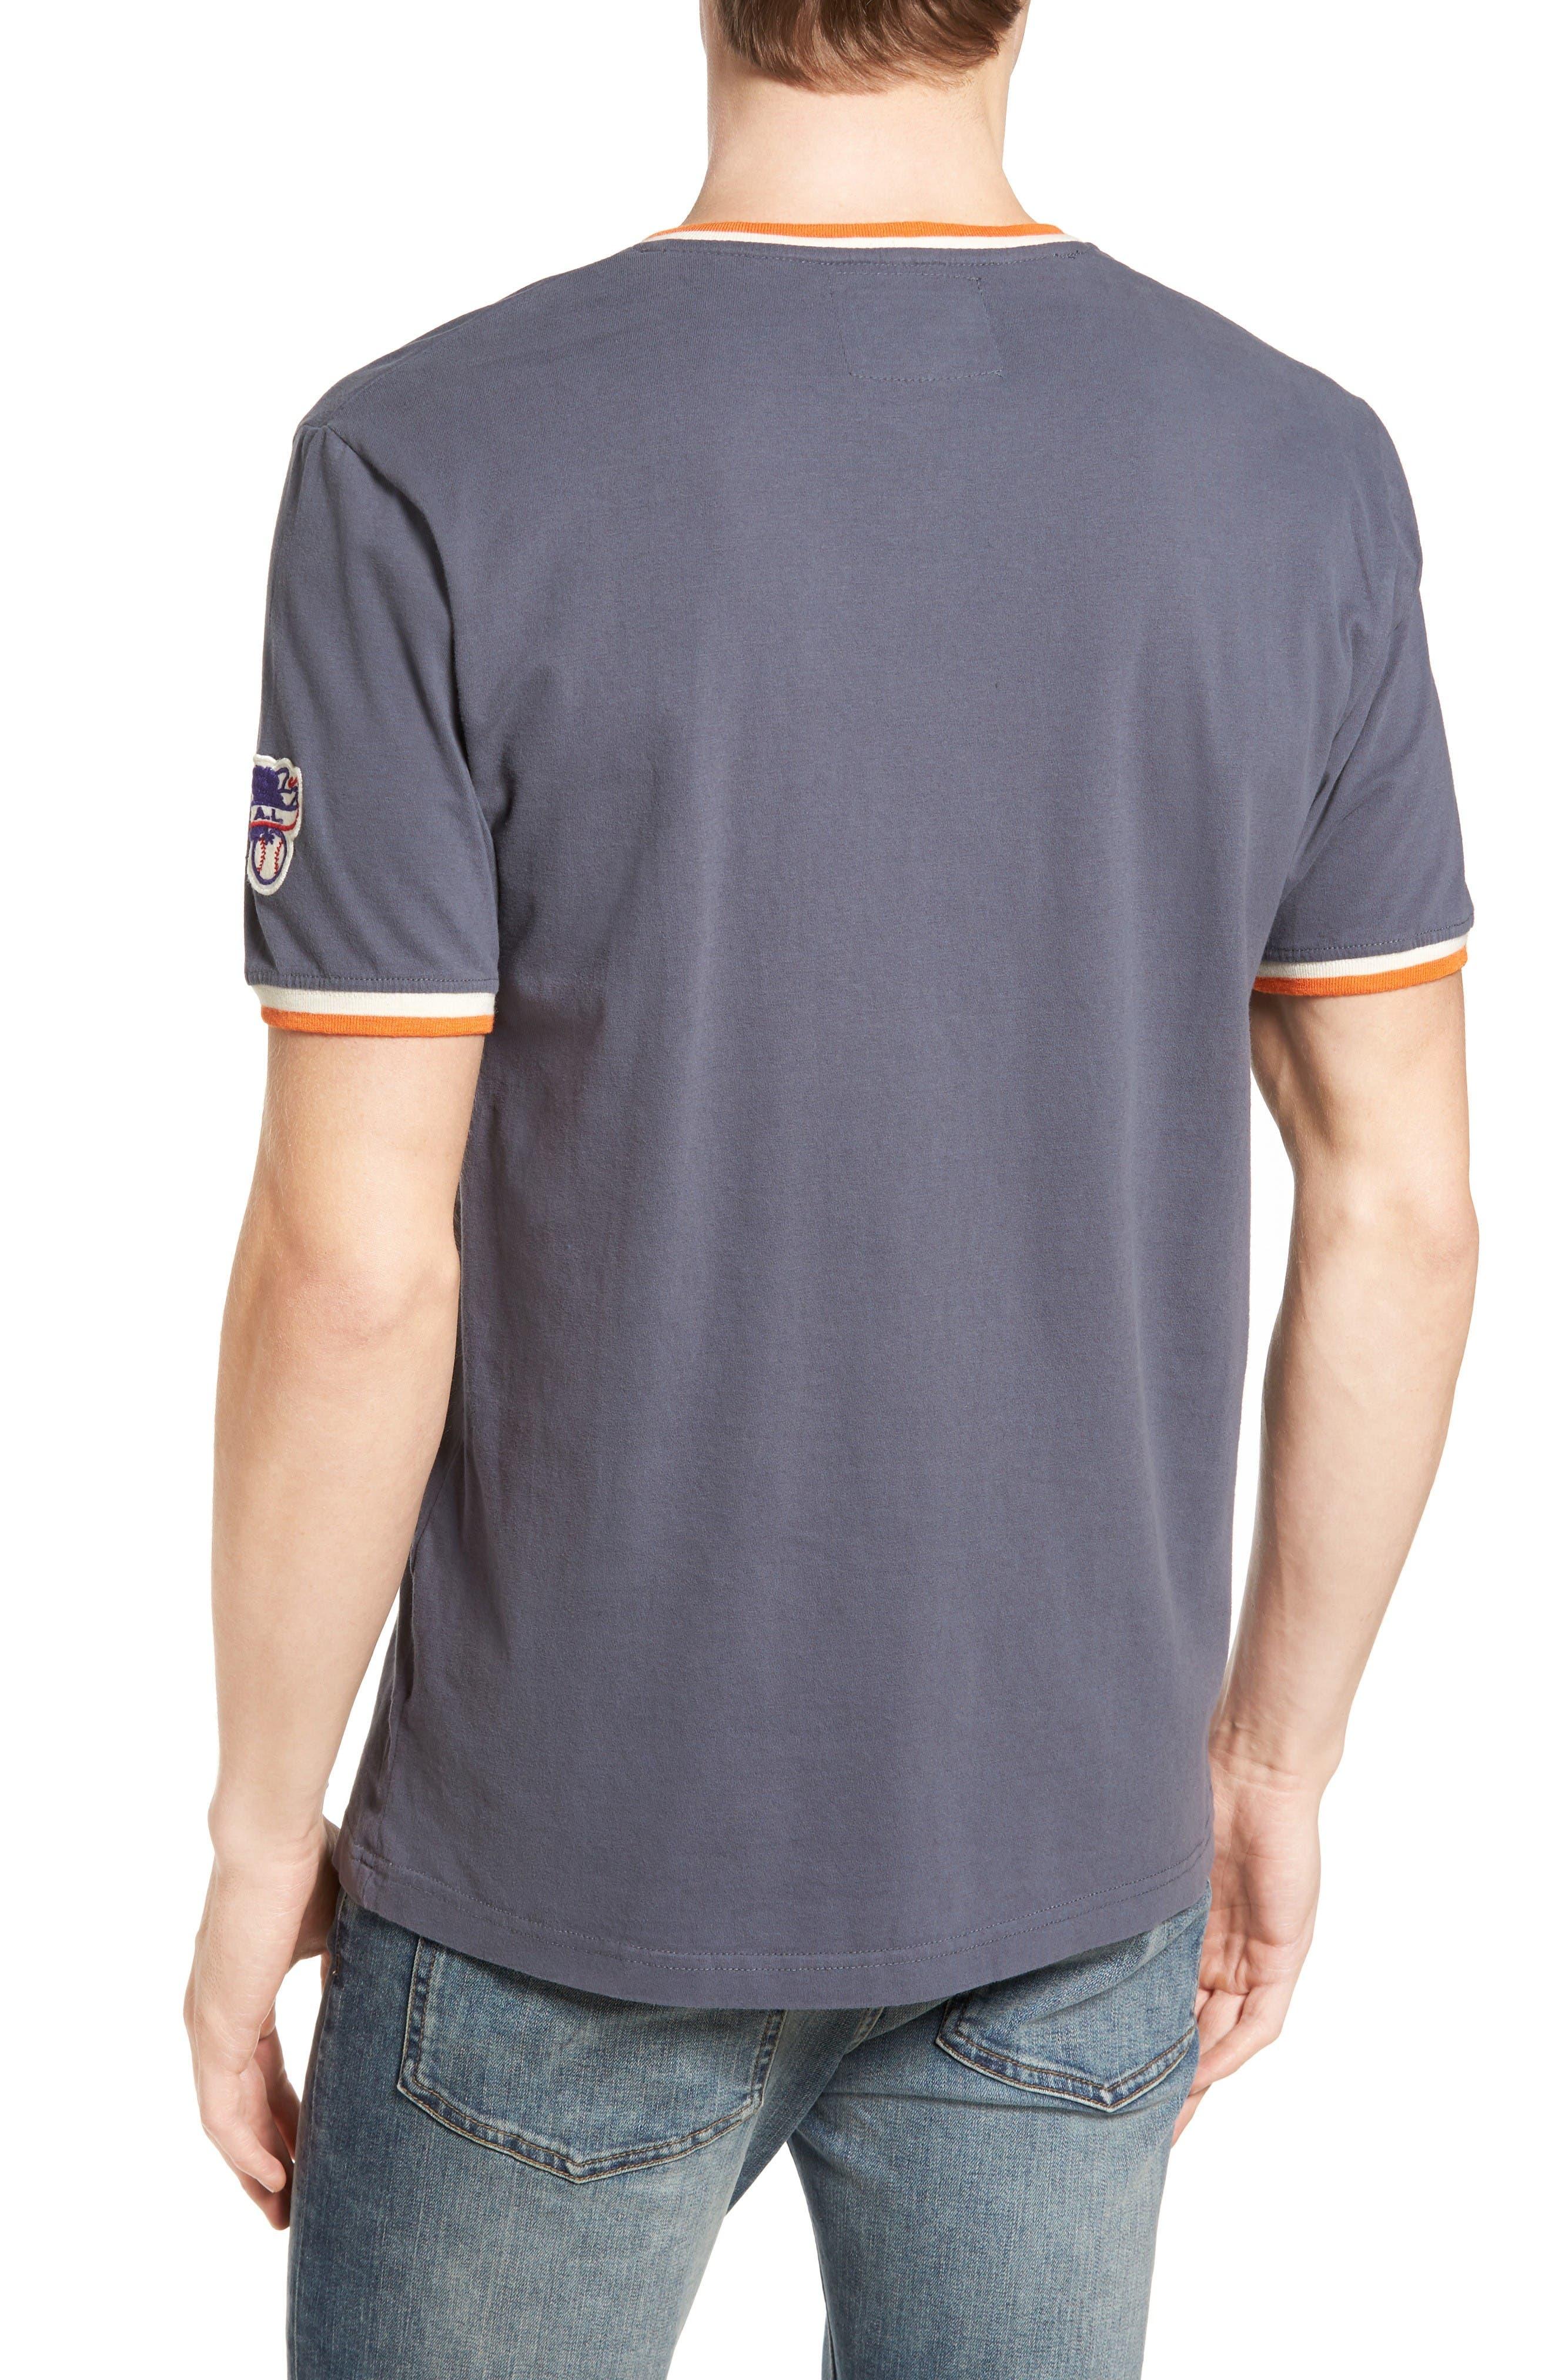 Eastwood Houston Astros T-Shirt,                             Alternate thumbnail 2, color,                             Navy